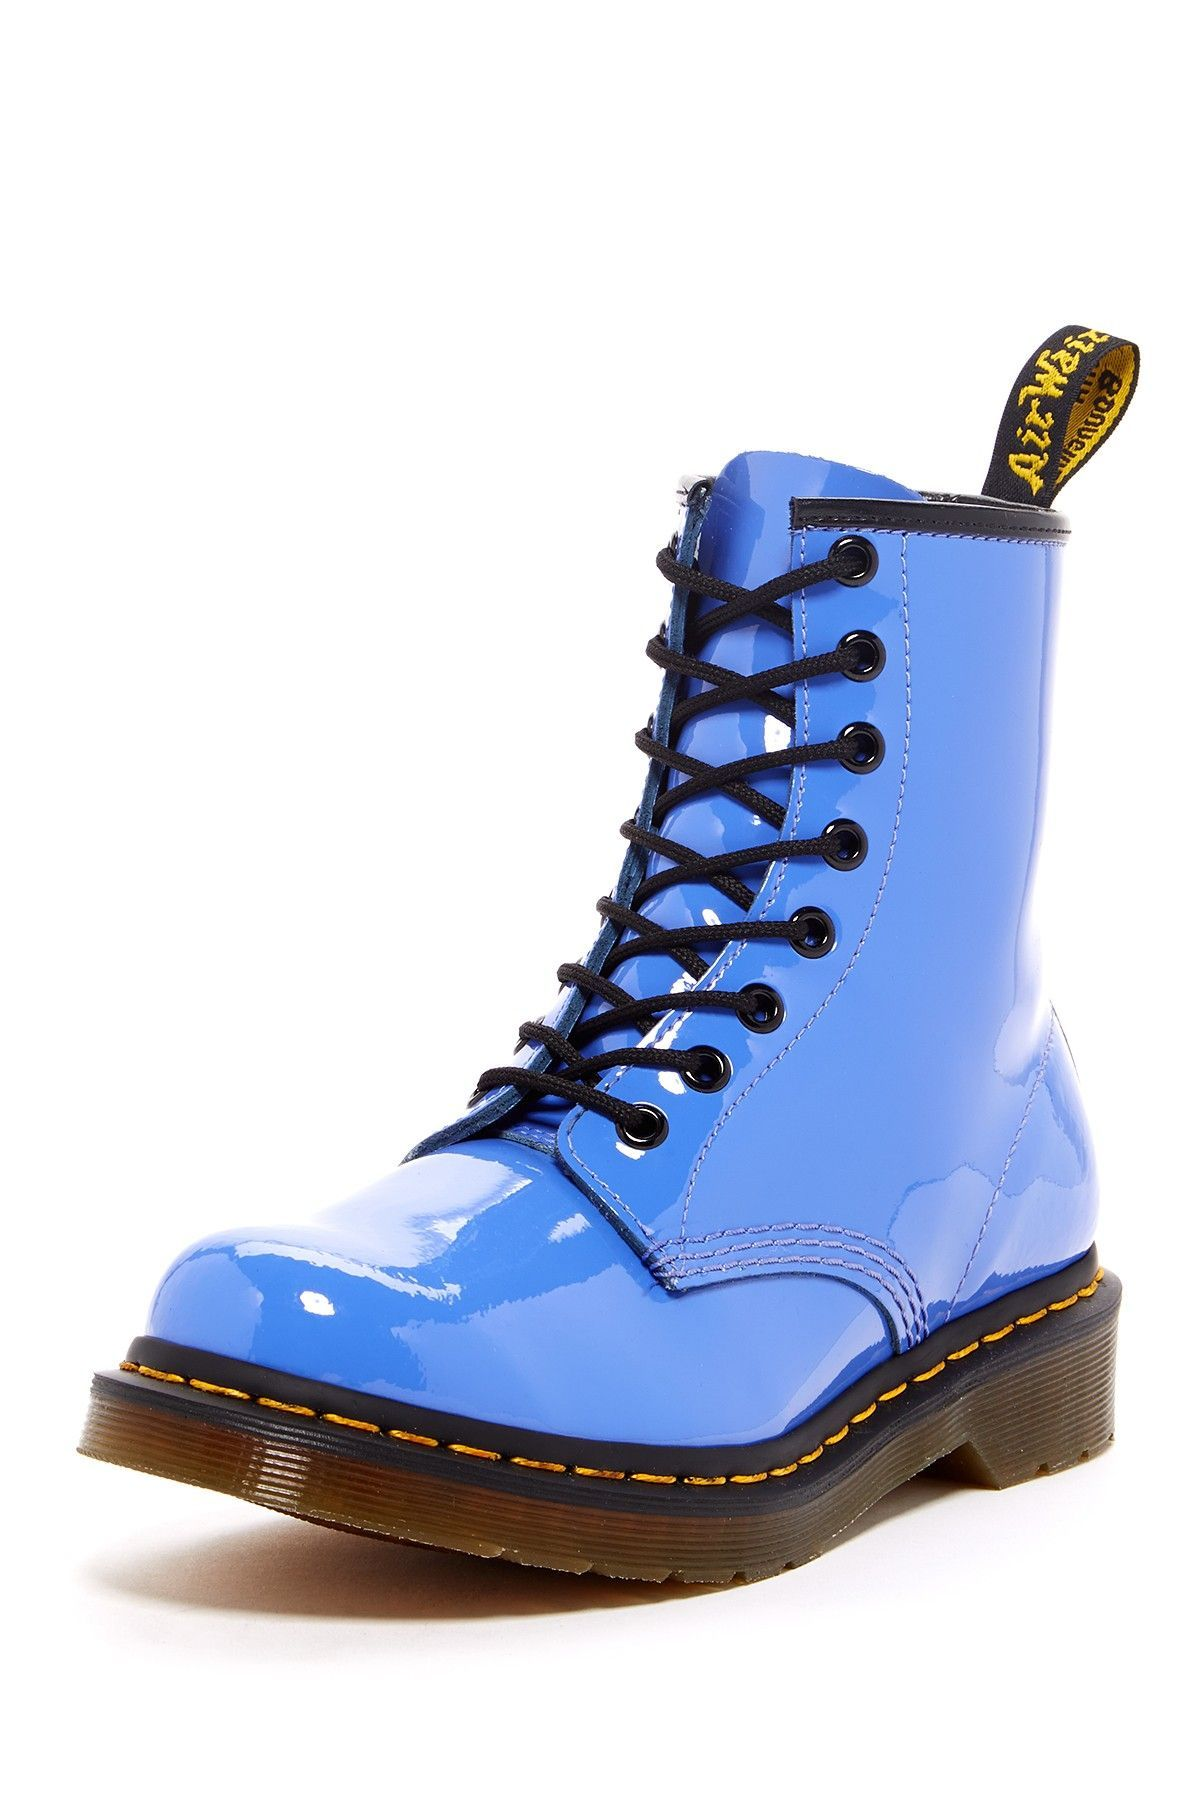 Dr. Martens Dr. Martens 1460 W Lace-Up Boot  3e008f2908